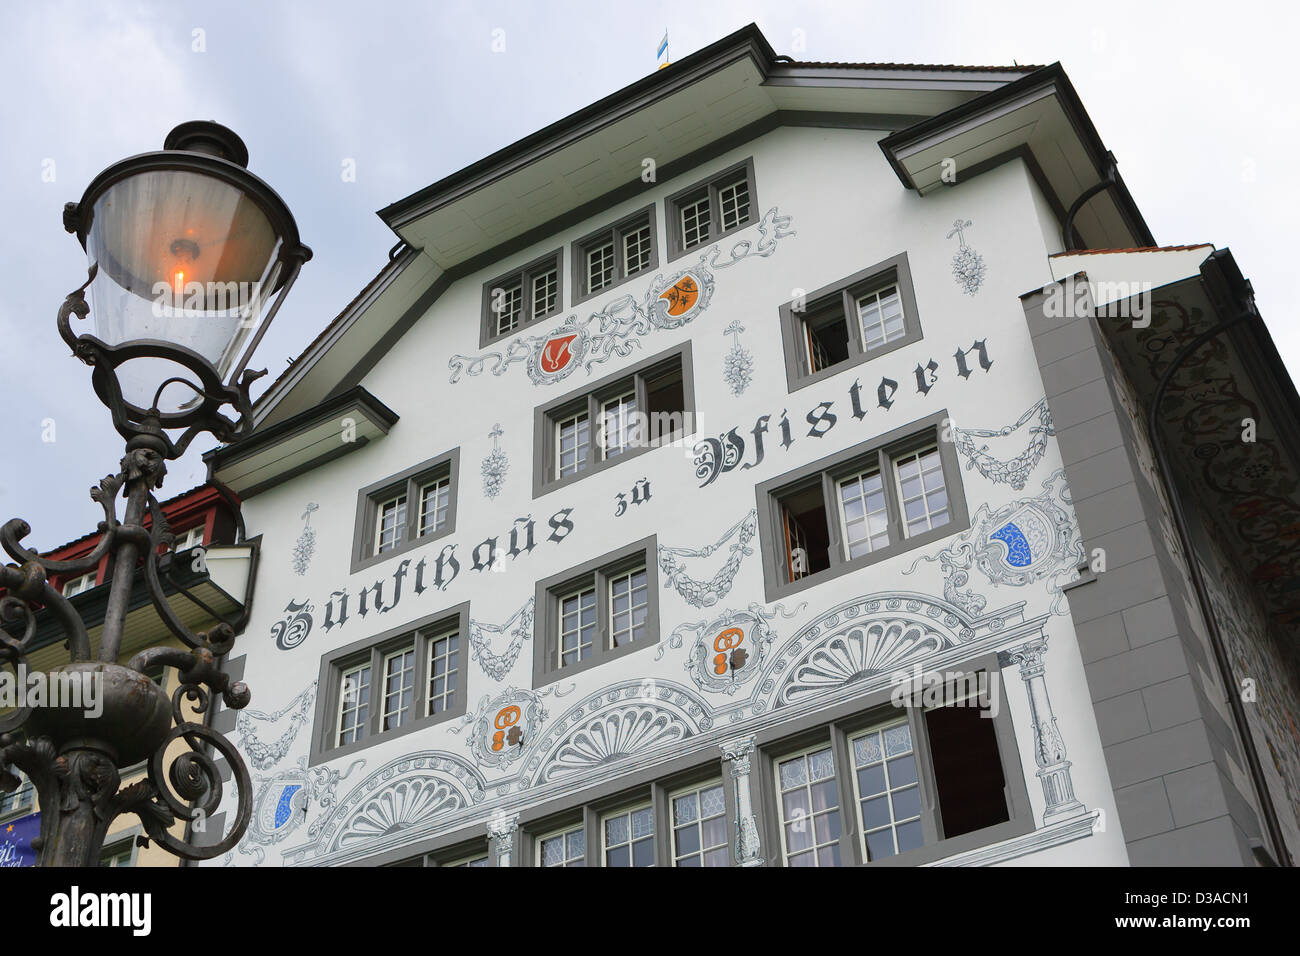 Architecture in Lucerne, Switzerland - Stock Image